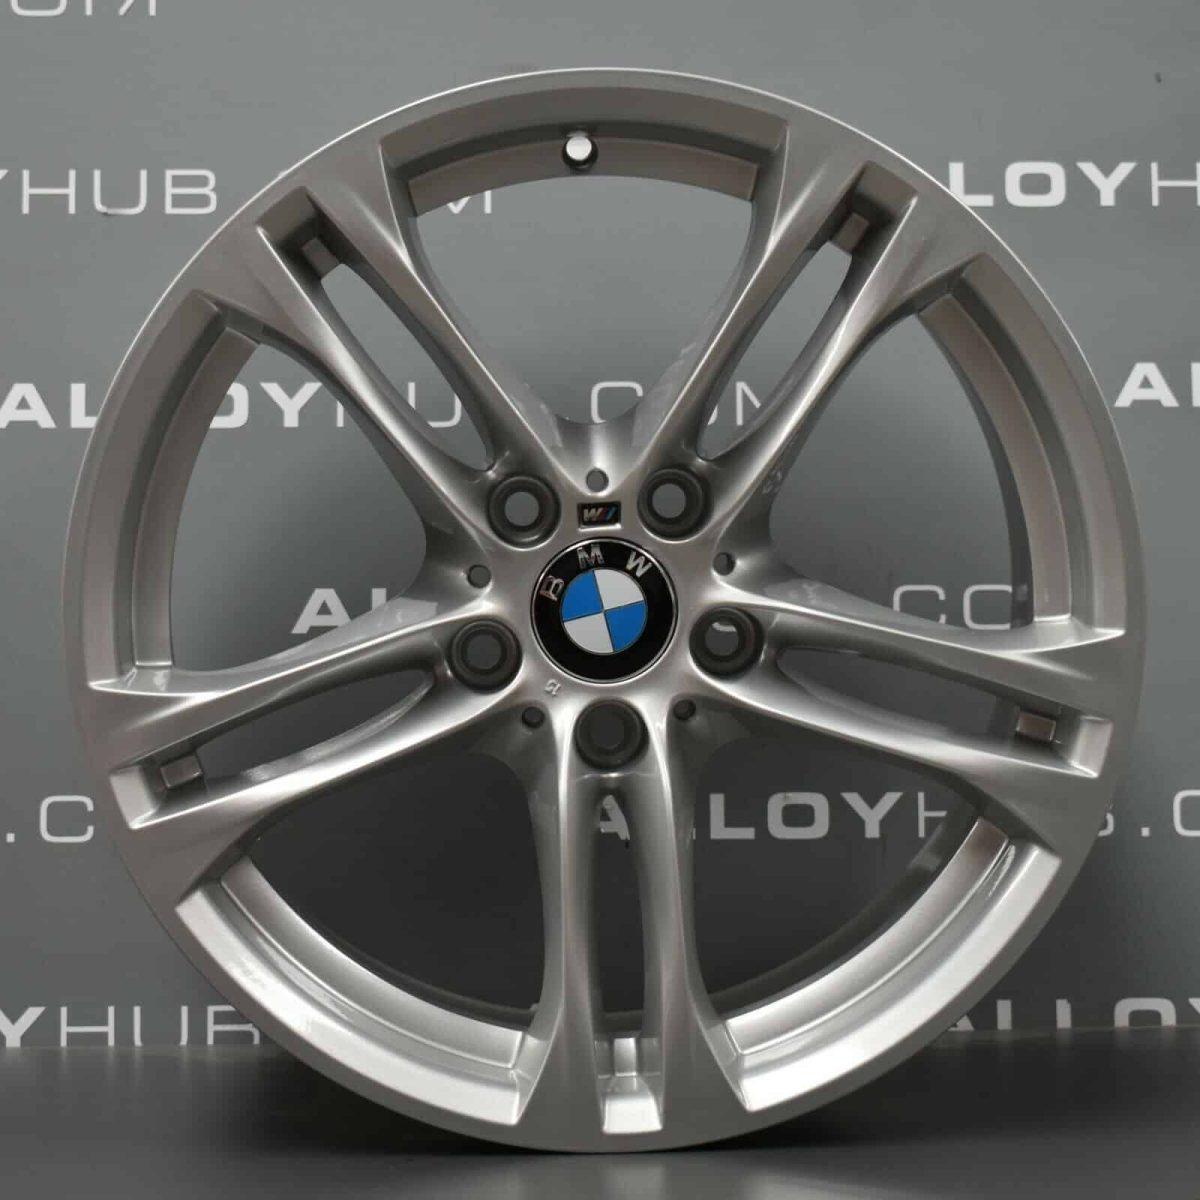 "Genuine BMW 5 Series F10 F11 613M Sport 5 Twin Spoke 18"" inch Alloy Wheels with Silver Finish 36117848572 36117848573"